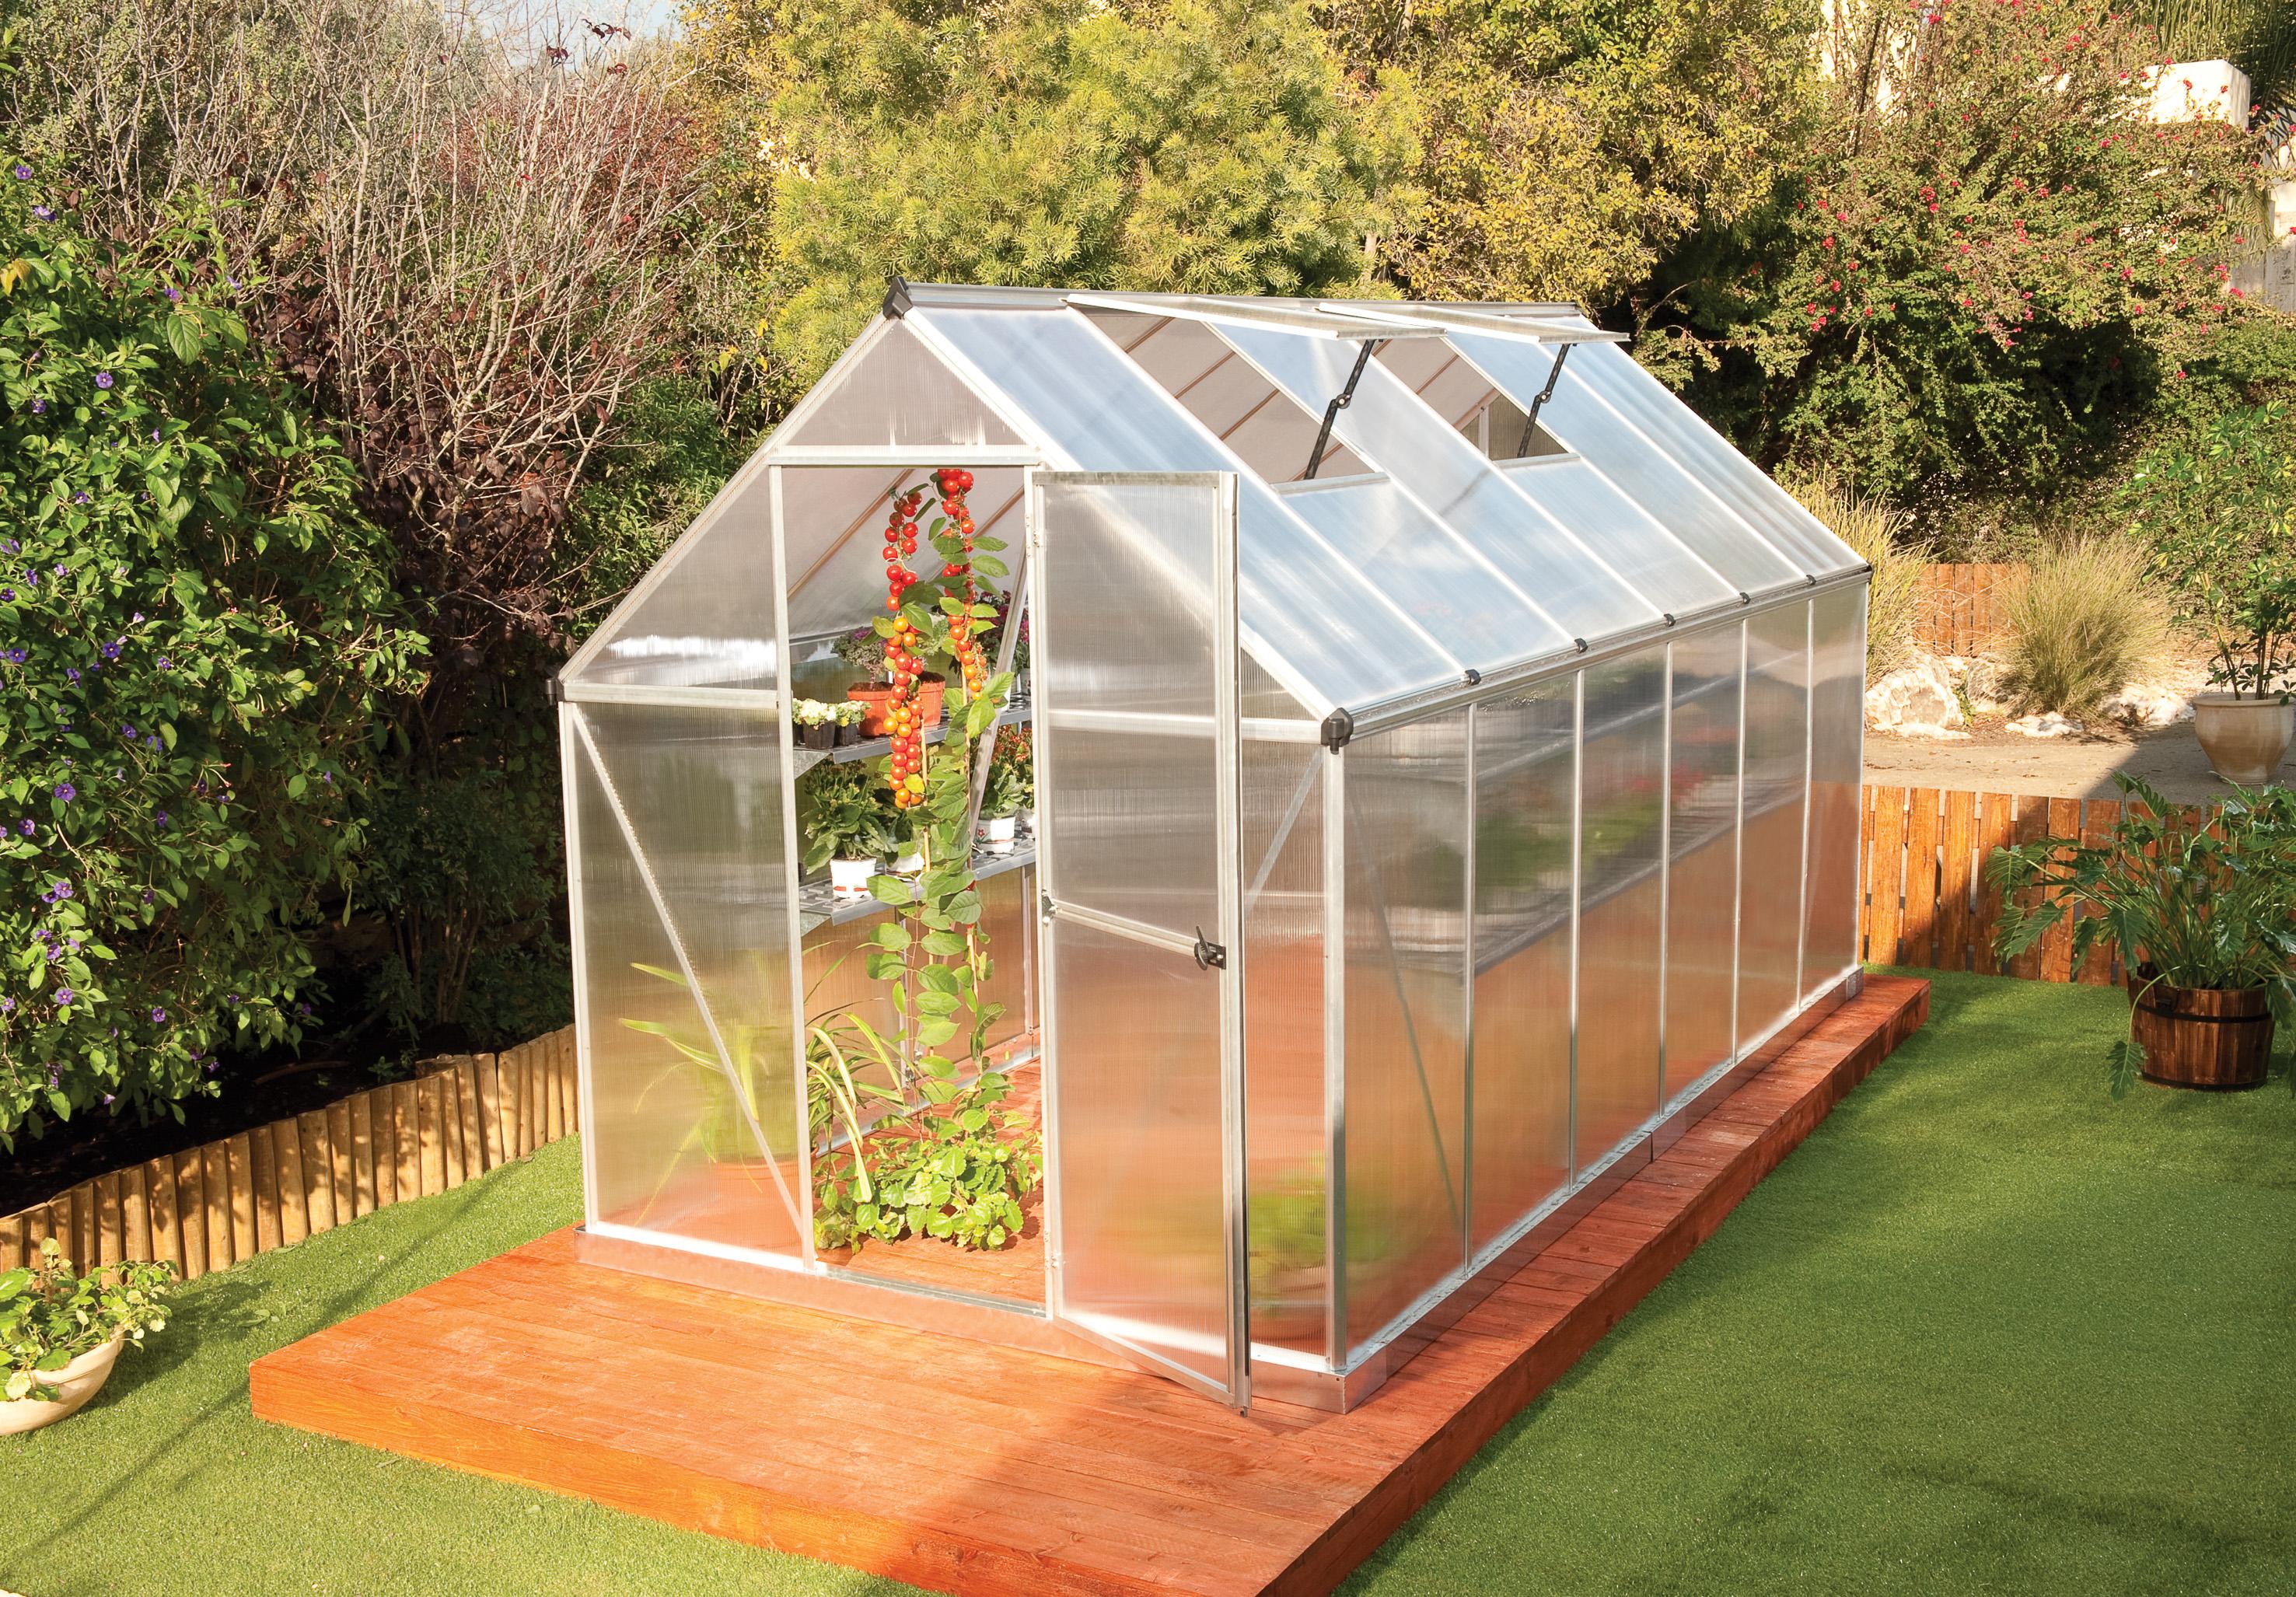 polykarbonátový skleník Palram multiline 6x12 + ZDARMA základna skleníku + ZDARMA automatický otvírač oken + hnojivo Biocin-FF + prodloužená ZÁRUKA 10 LET